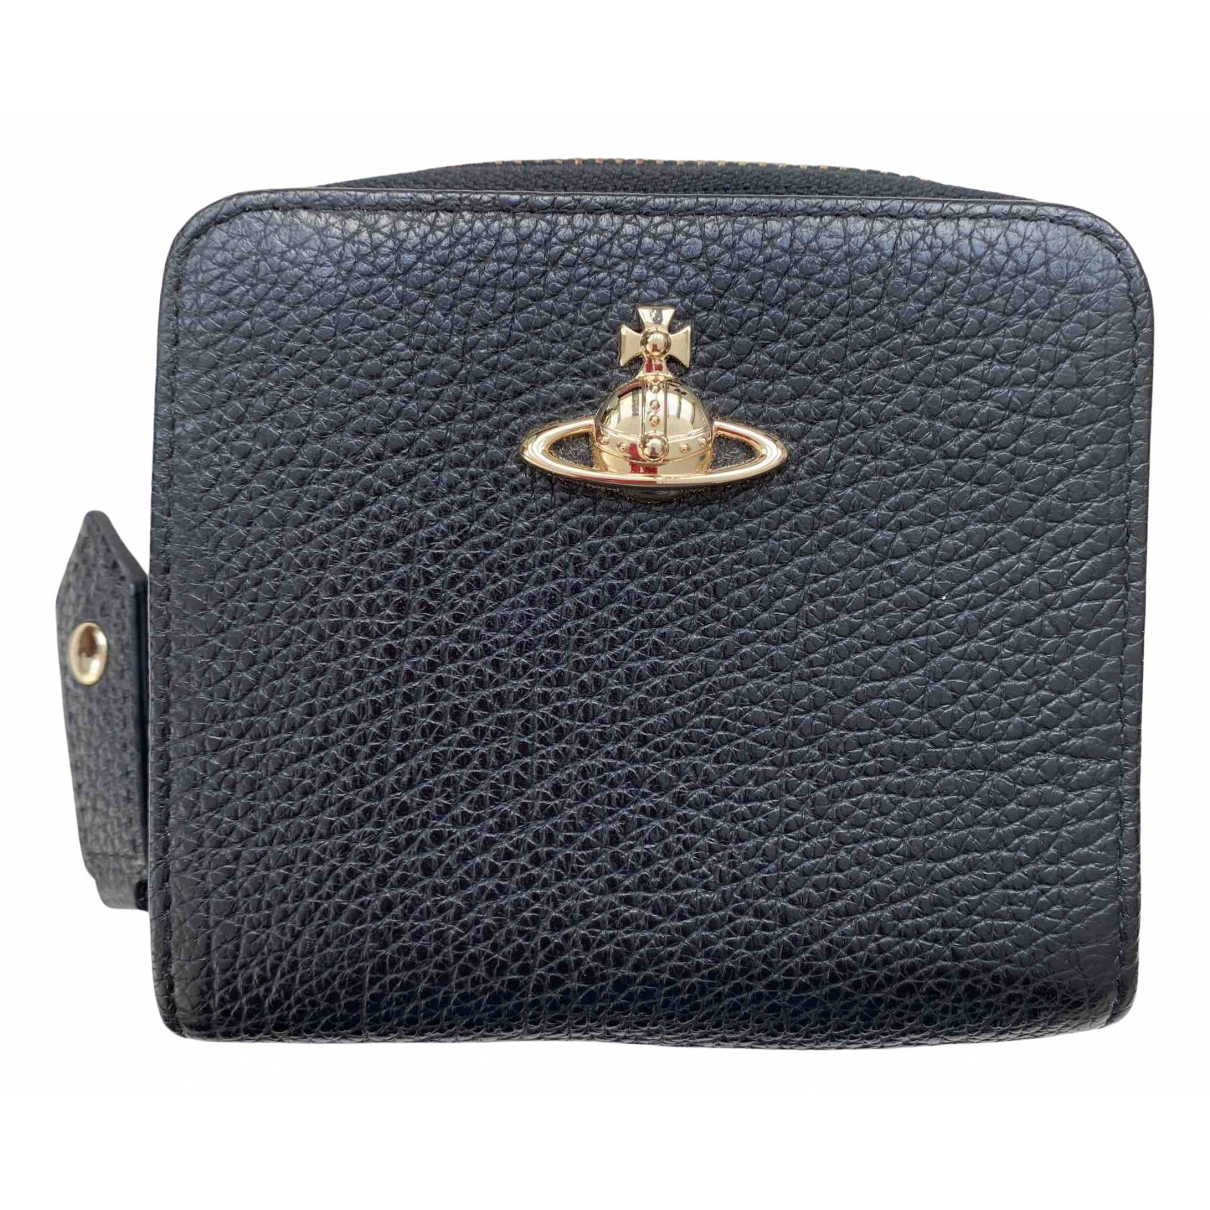 Vivienne Westwood \N Black Leather Small bag, wallet & cases for Men \N